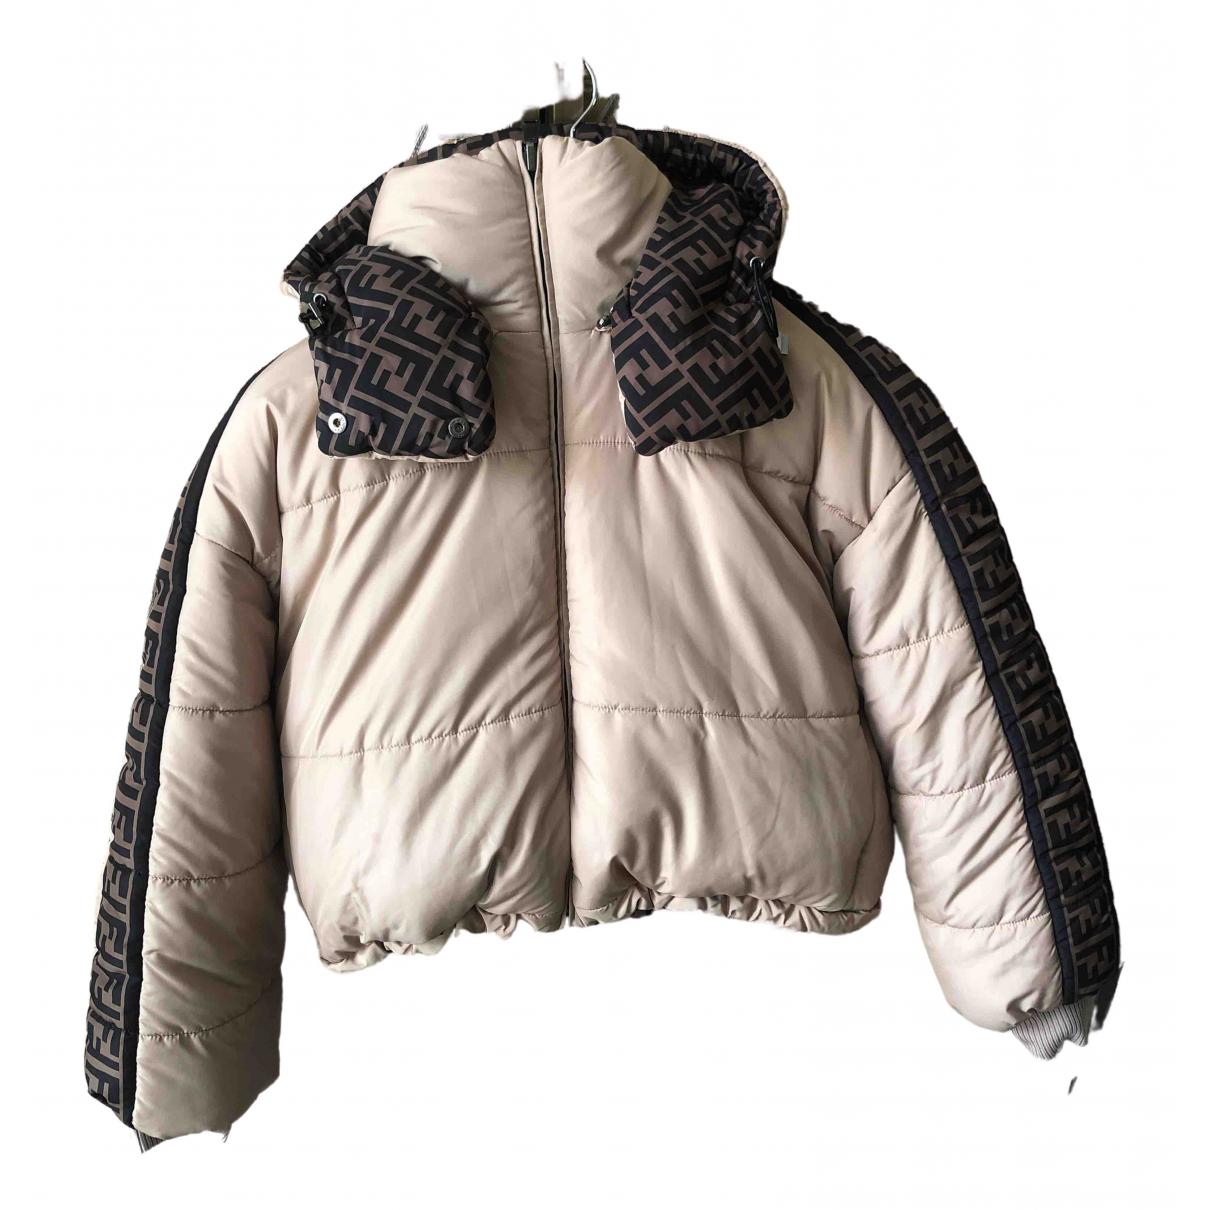 Fendi \N Brown Leather jacket for Women S International